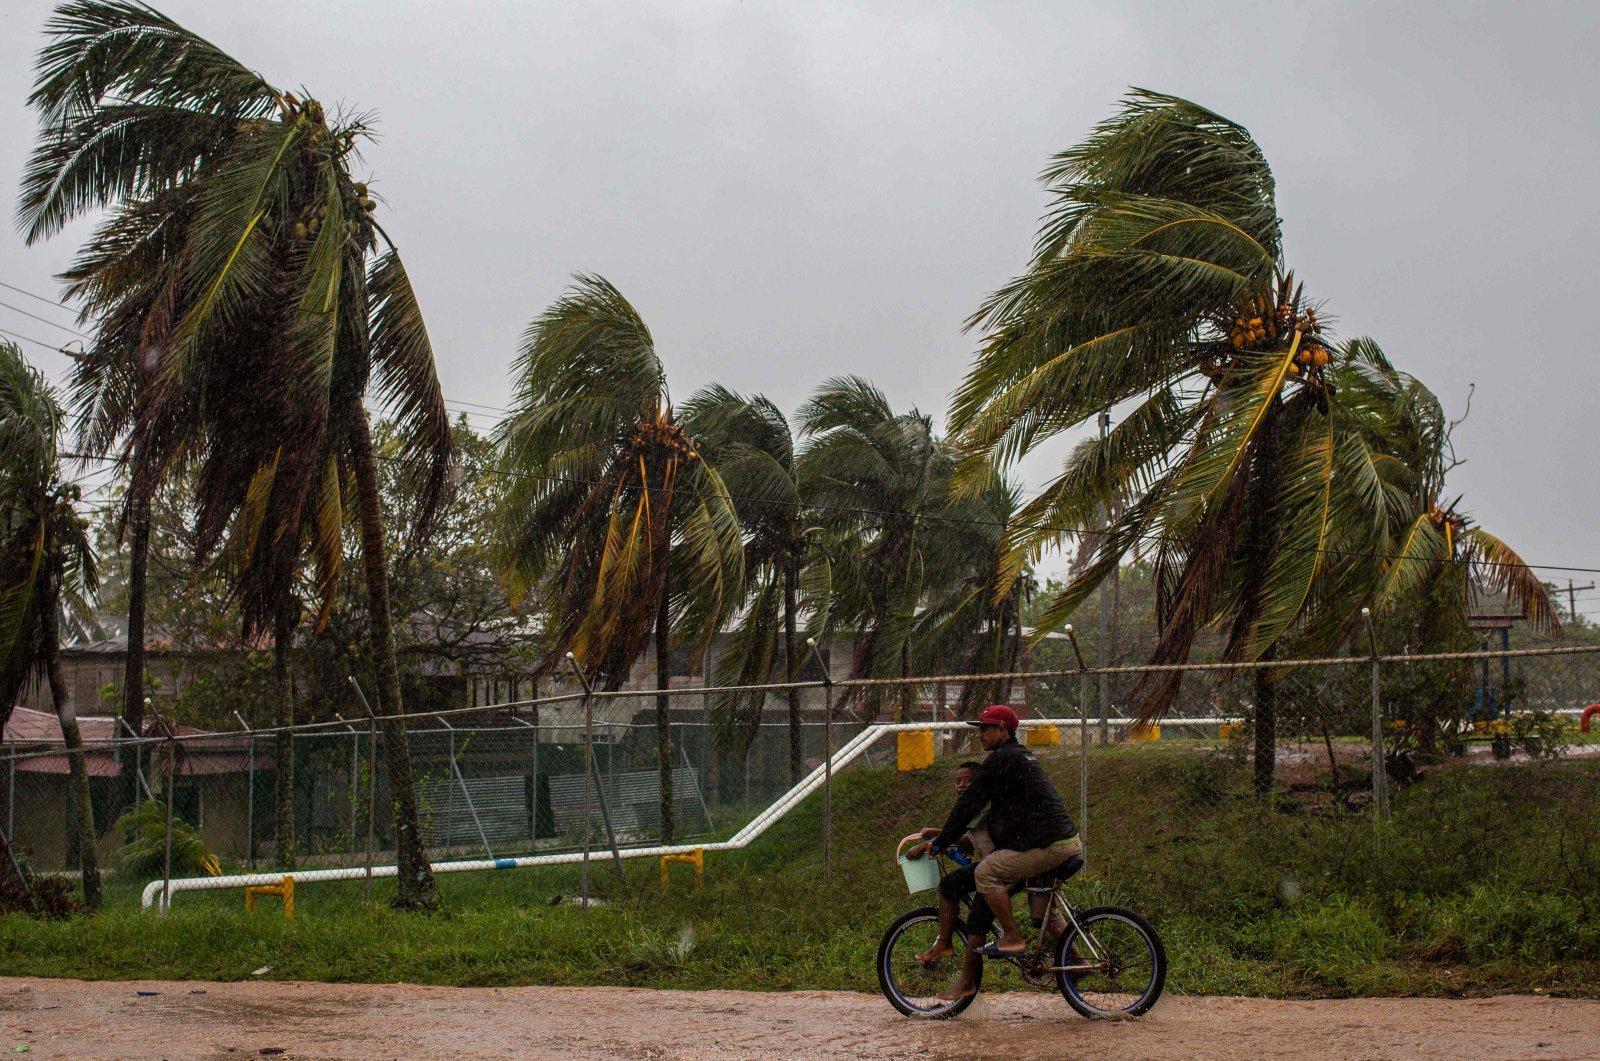 A man rides his bicycle in Bilwi, Puerto Cabezas, Nicaragua on Nov. 16, 2020. (AFP Photo)